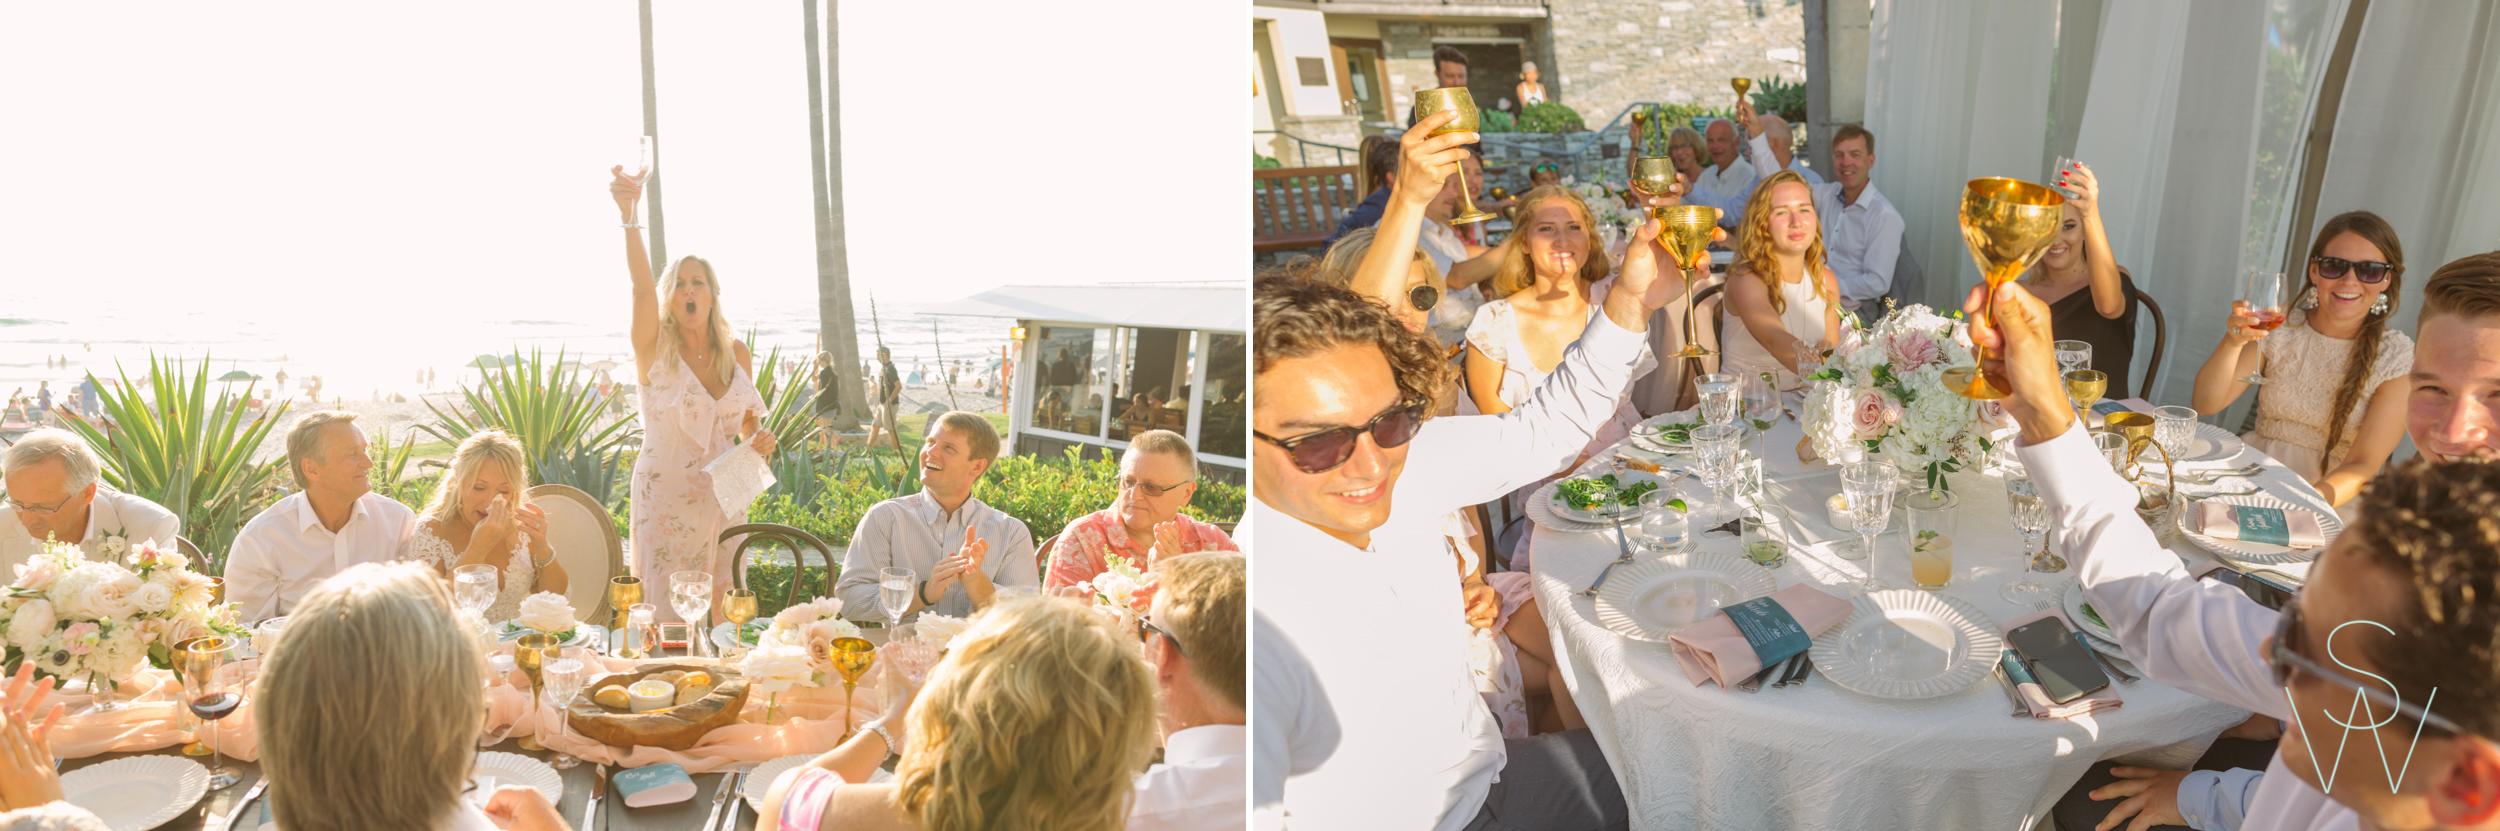 151DEL.MAR.WEDDINGS.photography.shewanders.JPG